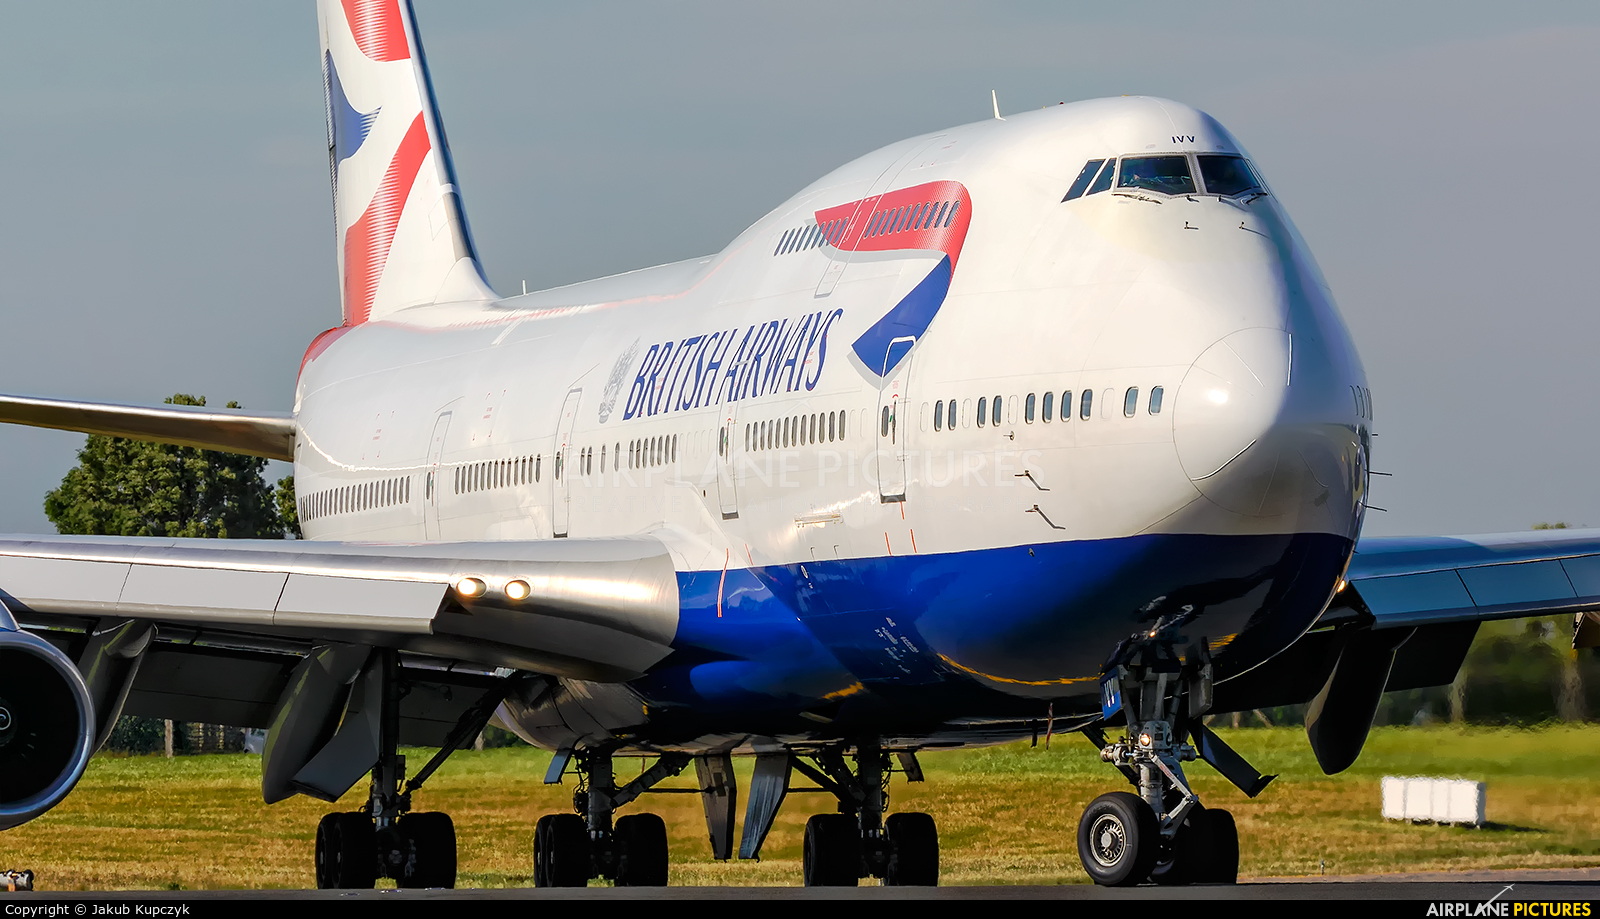 British Airways G-CIVV aircraft at Dublin